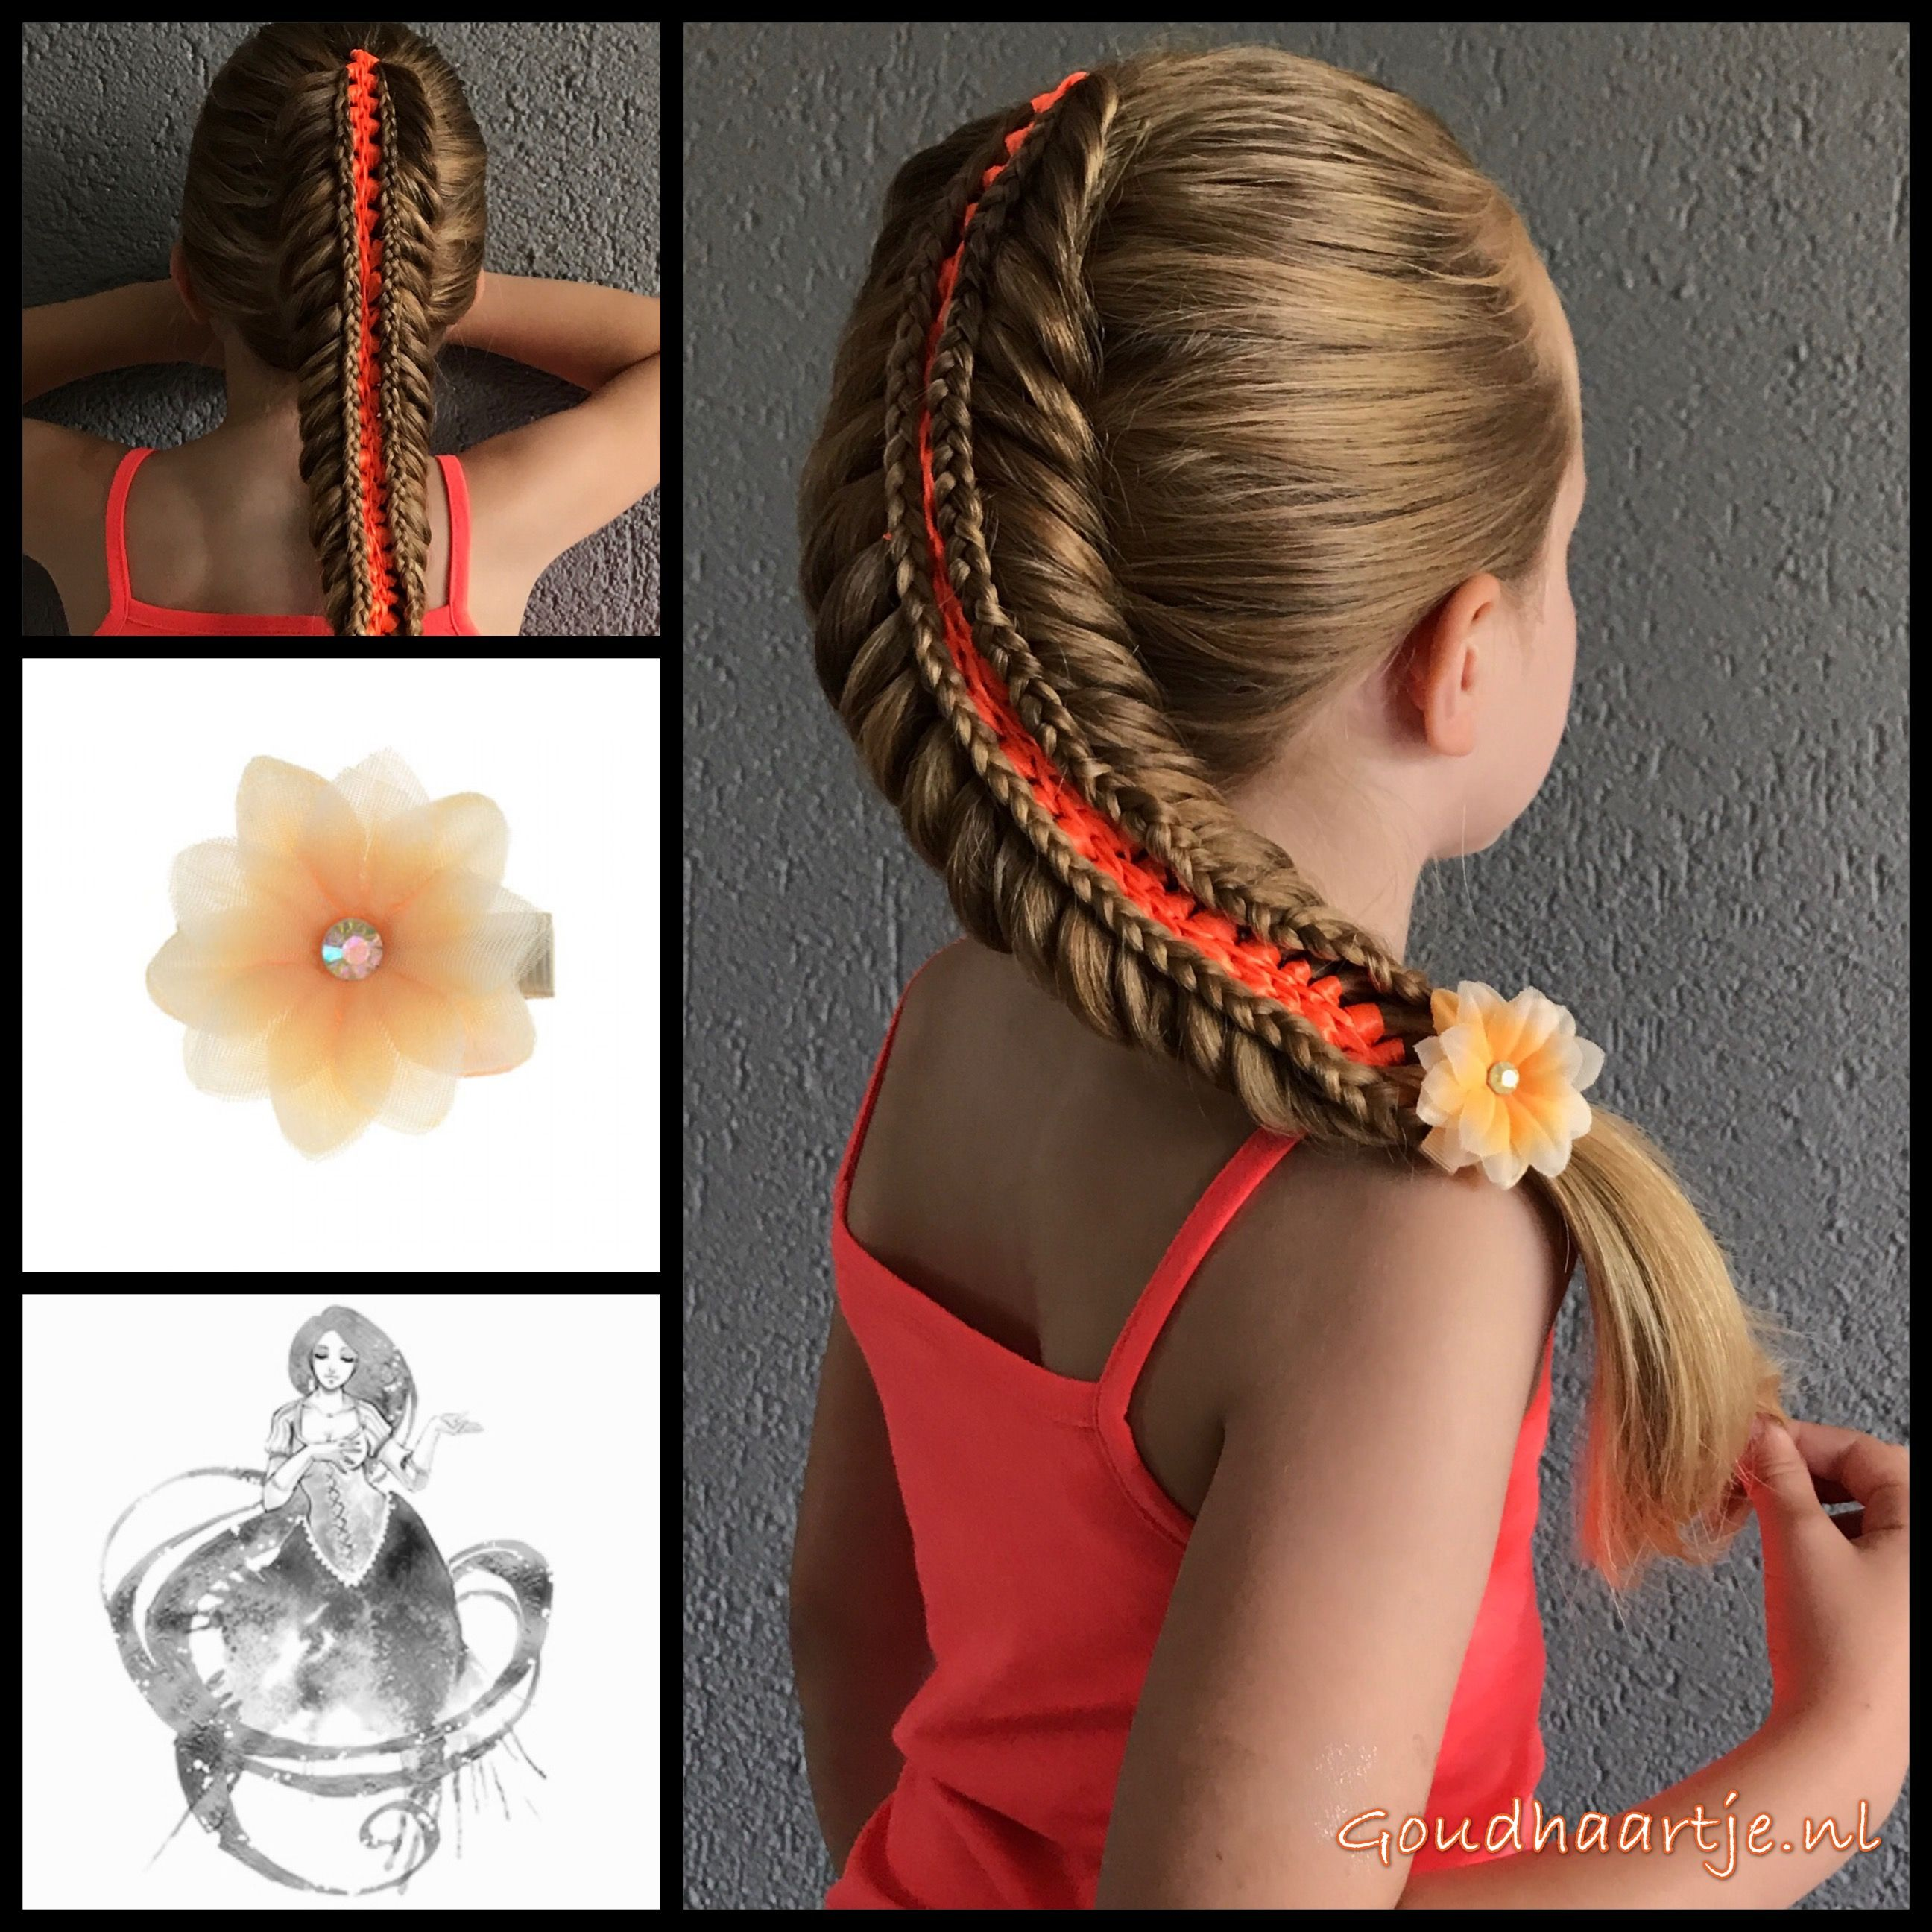 Stacked woven fishtail ribbon braid with a beautiful flower from the webshop www.goudhaartje.nl (worldwide shipping) Hairstyle inspired by: @lesya_zherdeva (instagram) #wovenfishtailribbonbraid #orange #orangeisthenewblack #hair #hairstyle #girly #longhair #plait #plaits #trenza #beautifulhair #gorgeoushair #stunninghair #braid #braids #hairinspo #hairinspiration #hairideas #braidideas #hairfashion #hairaccessories #ribbonbraid #vlecht #haar #goudhaartje